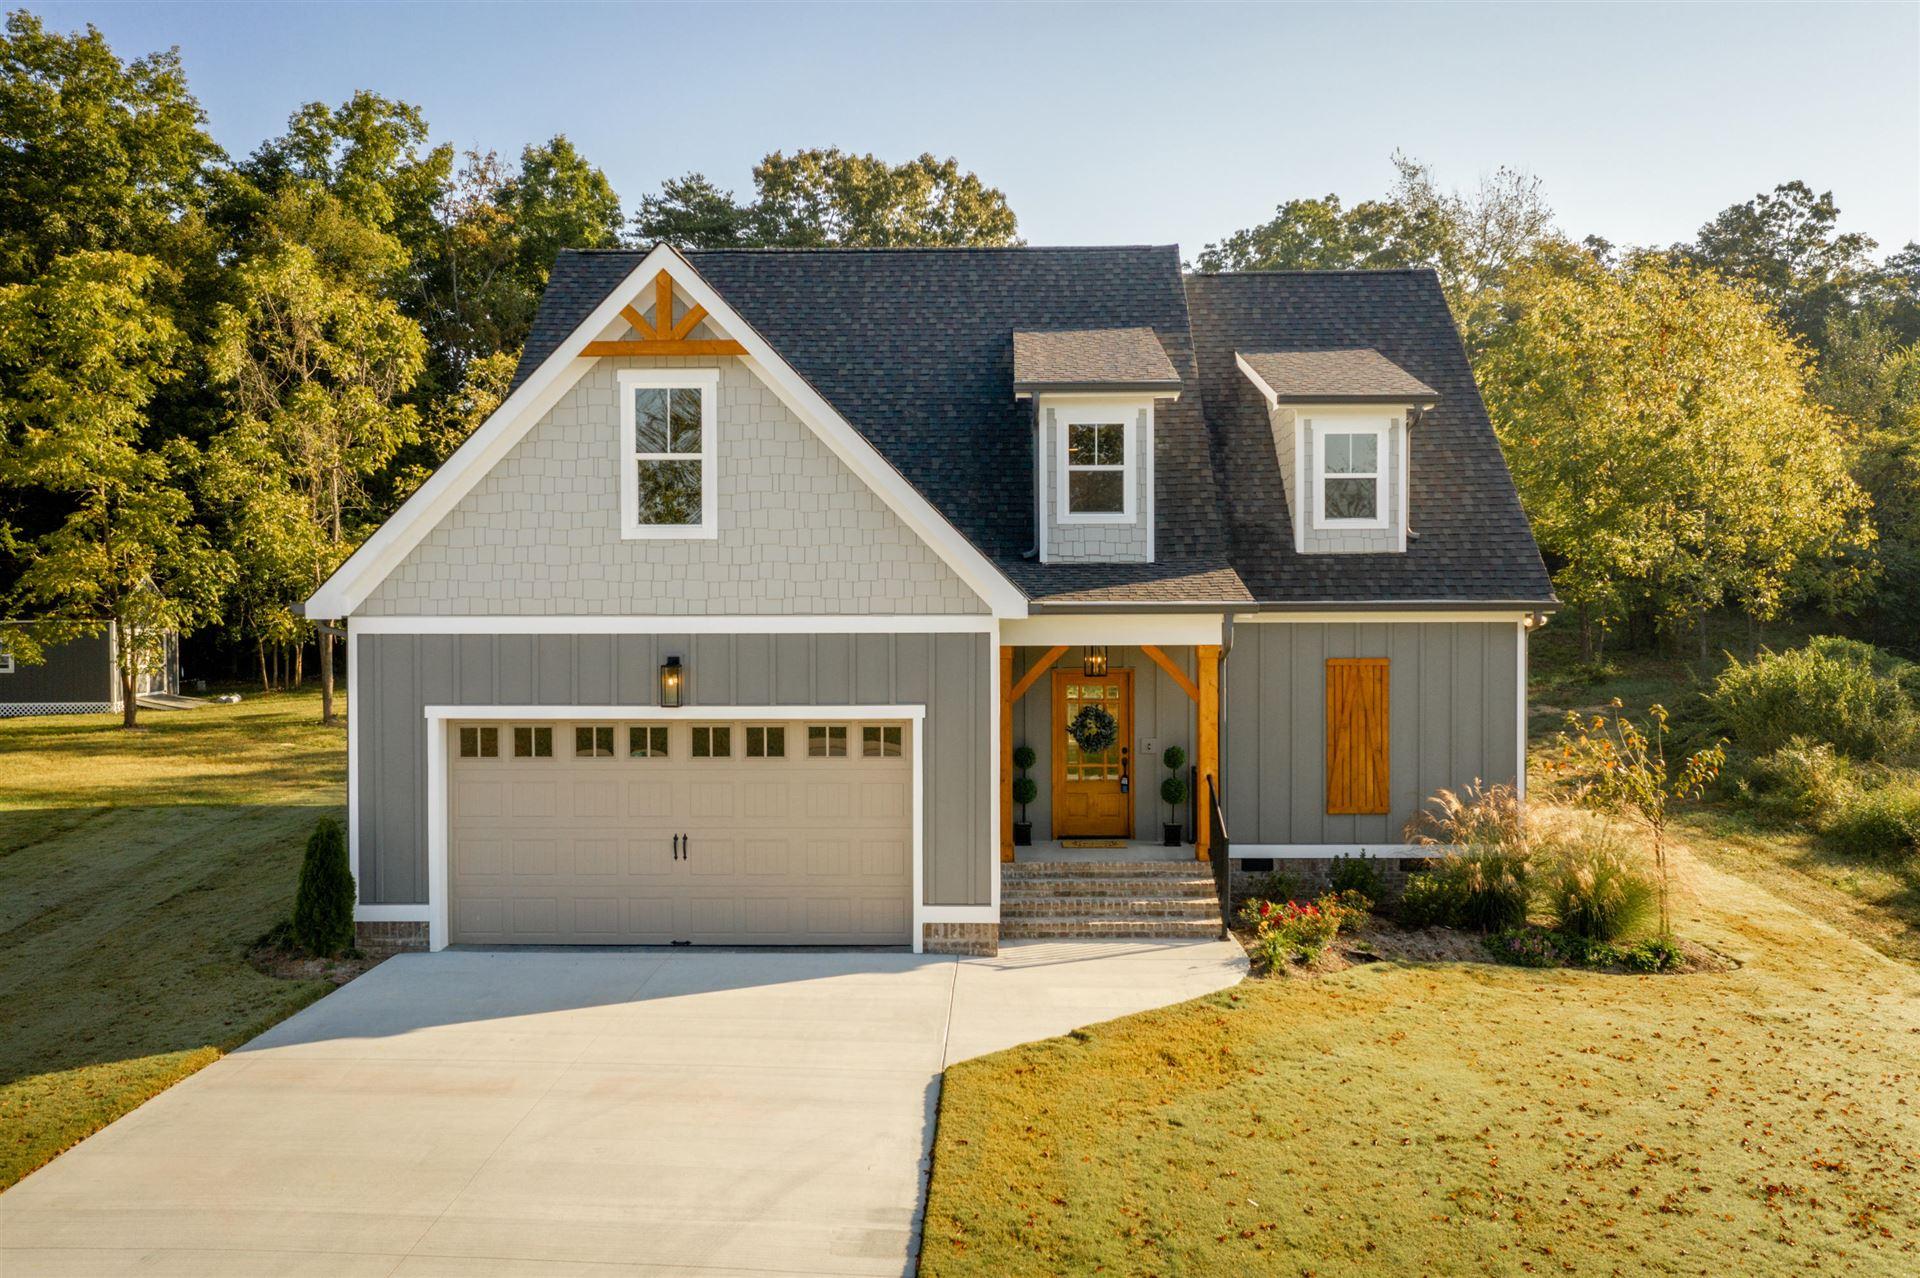 8701 Woodbury Acre Ct, Harrison, TN 37341 - #: 1307428